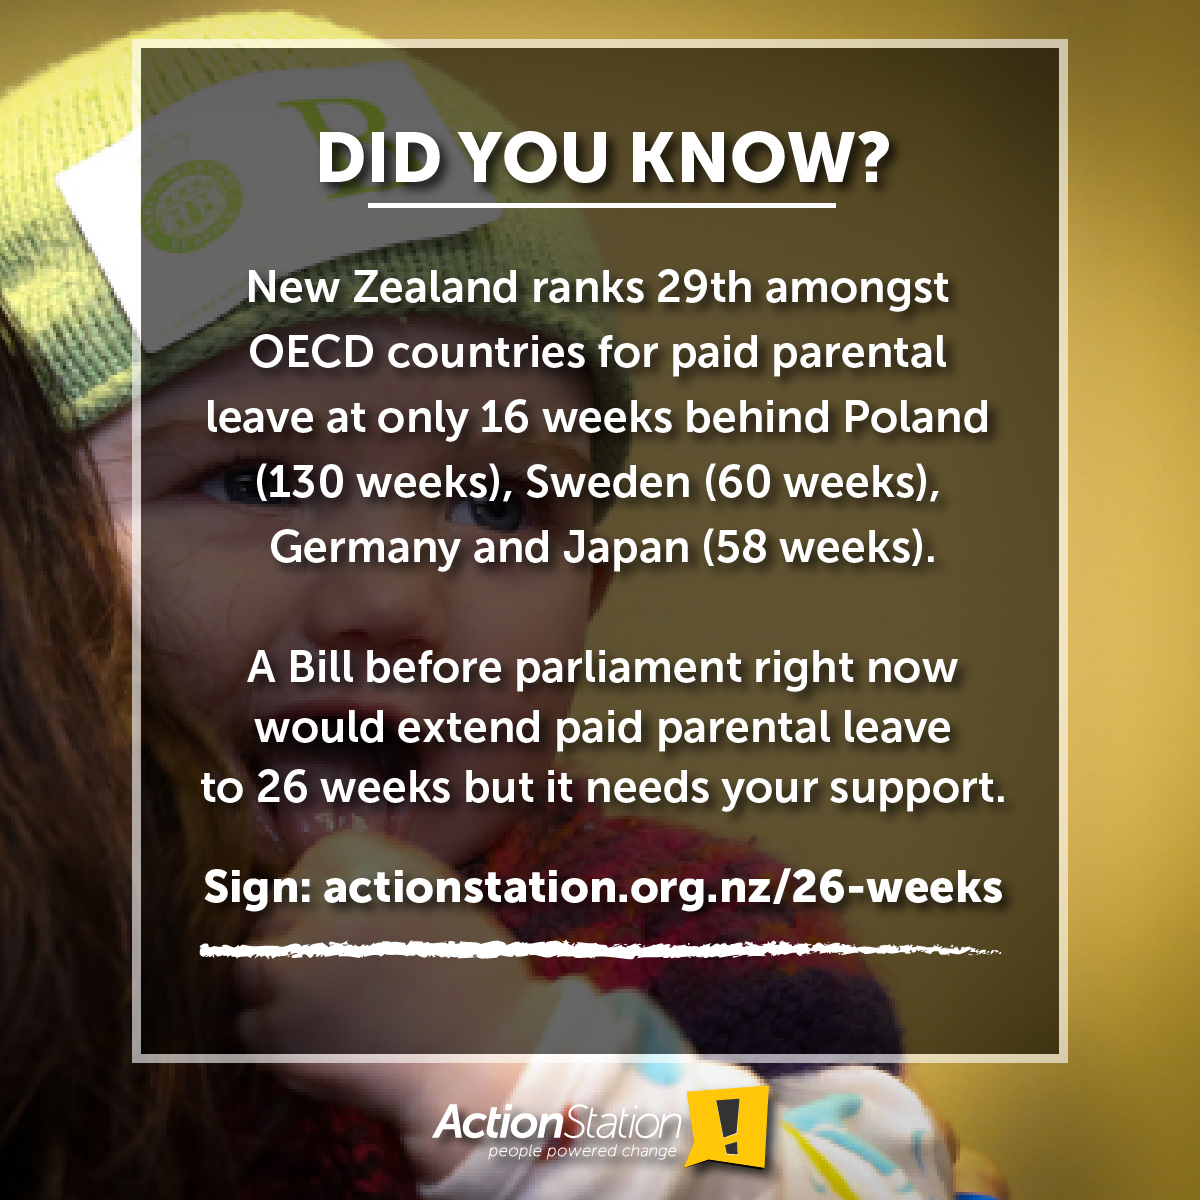 Paid-parental-leave-shareable.jpg